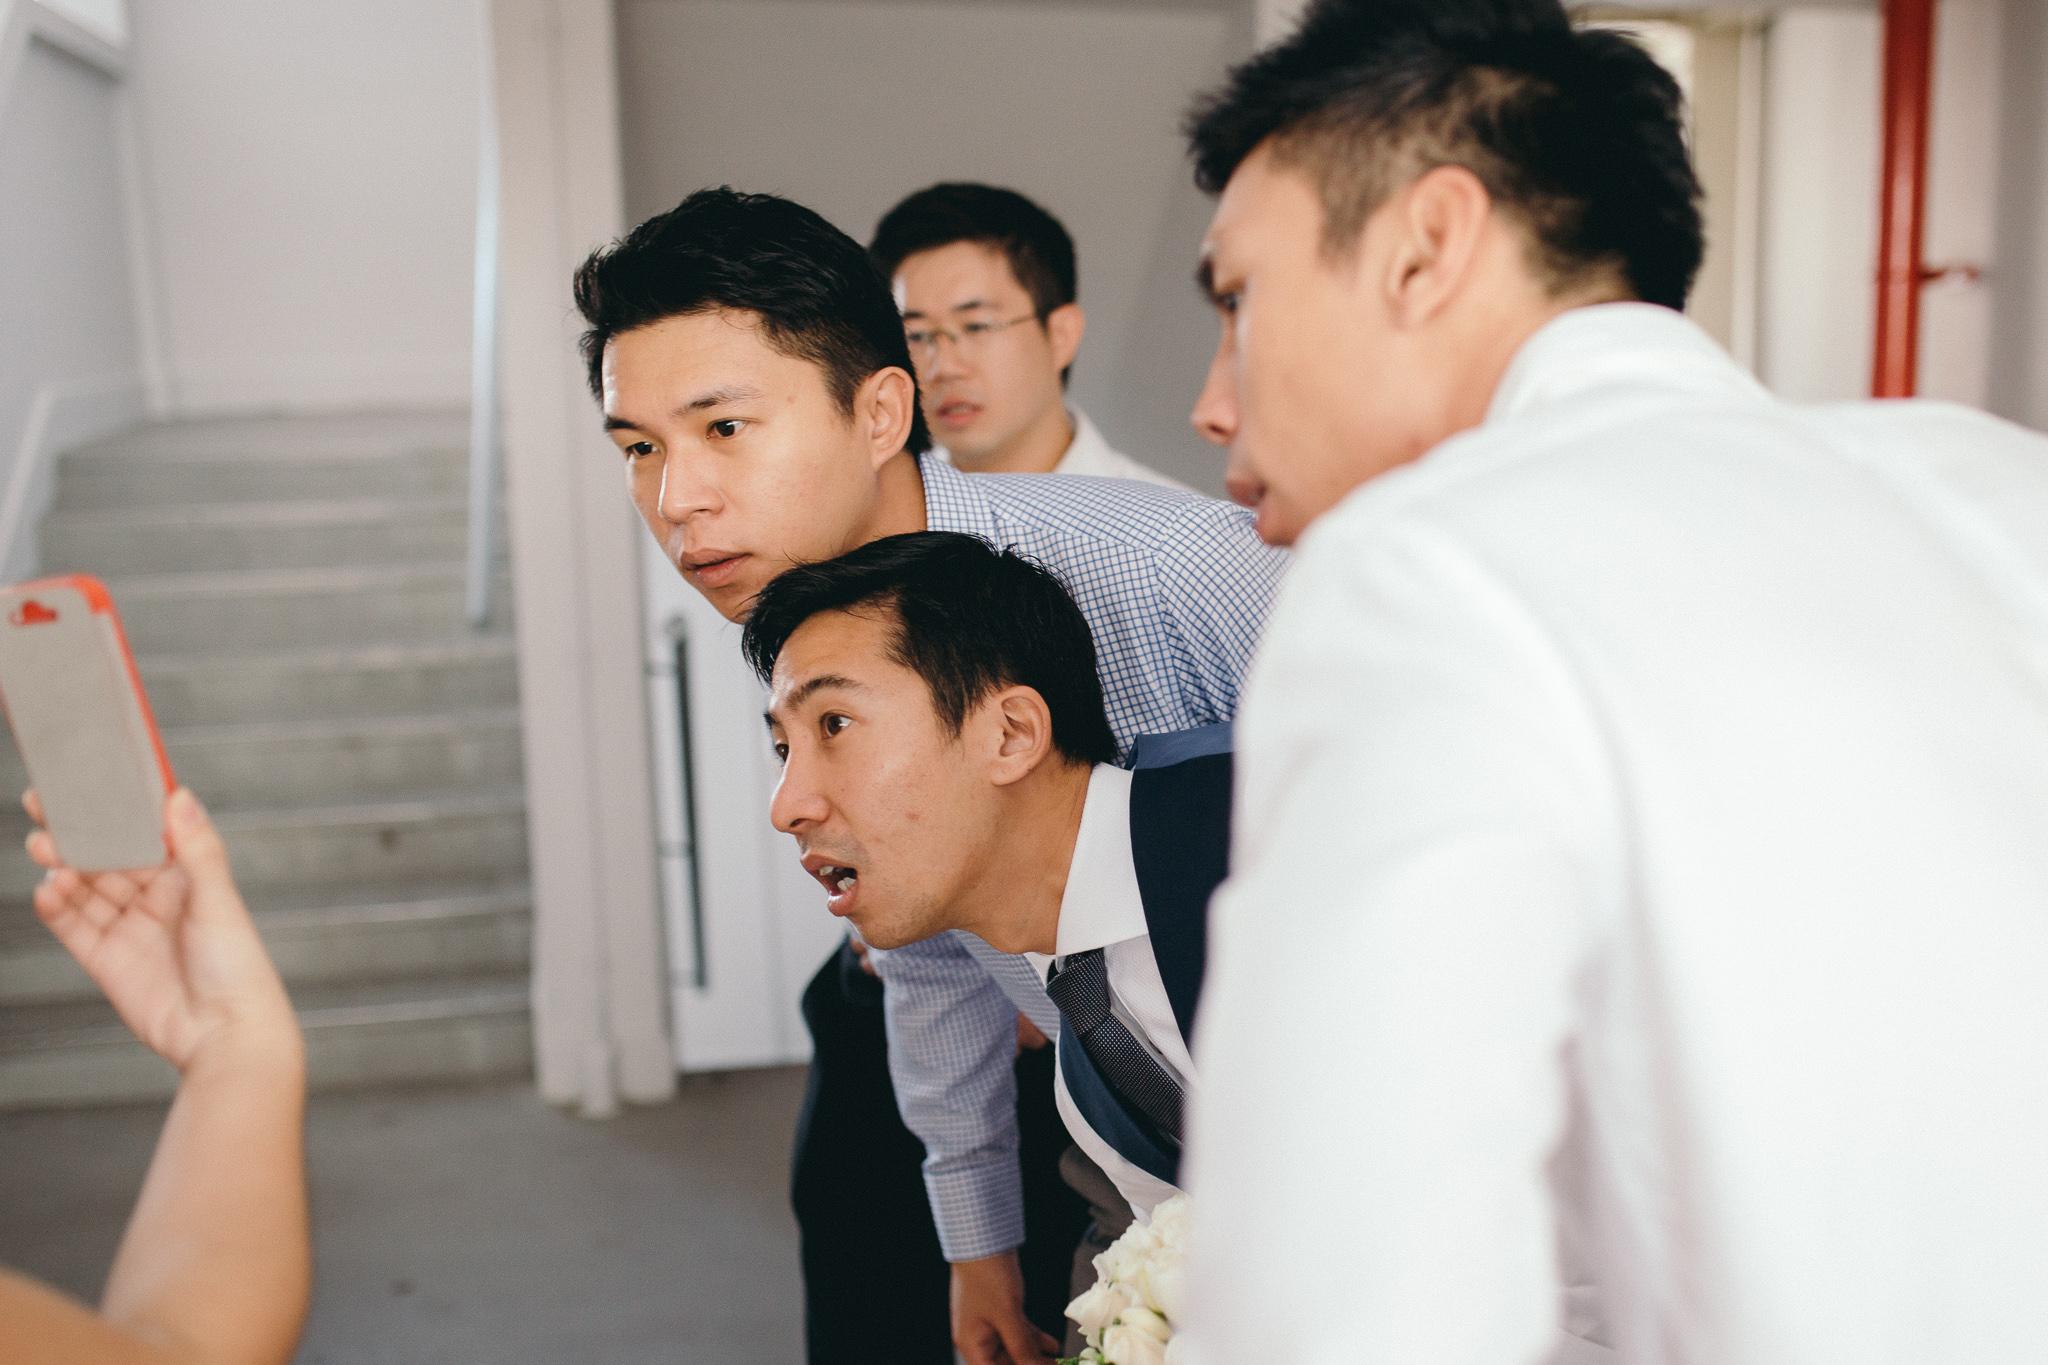 Juxtapose Pix - Wedding - Kelvin & Serene - church regent hotel 00008.jpg